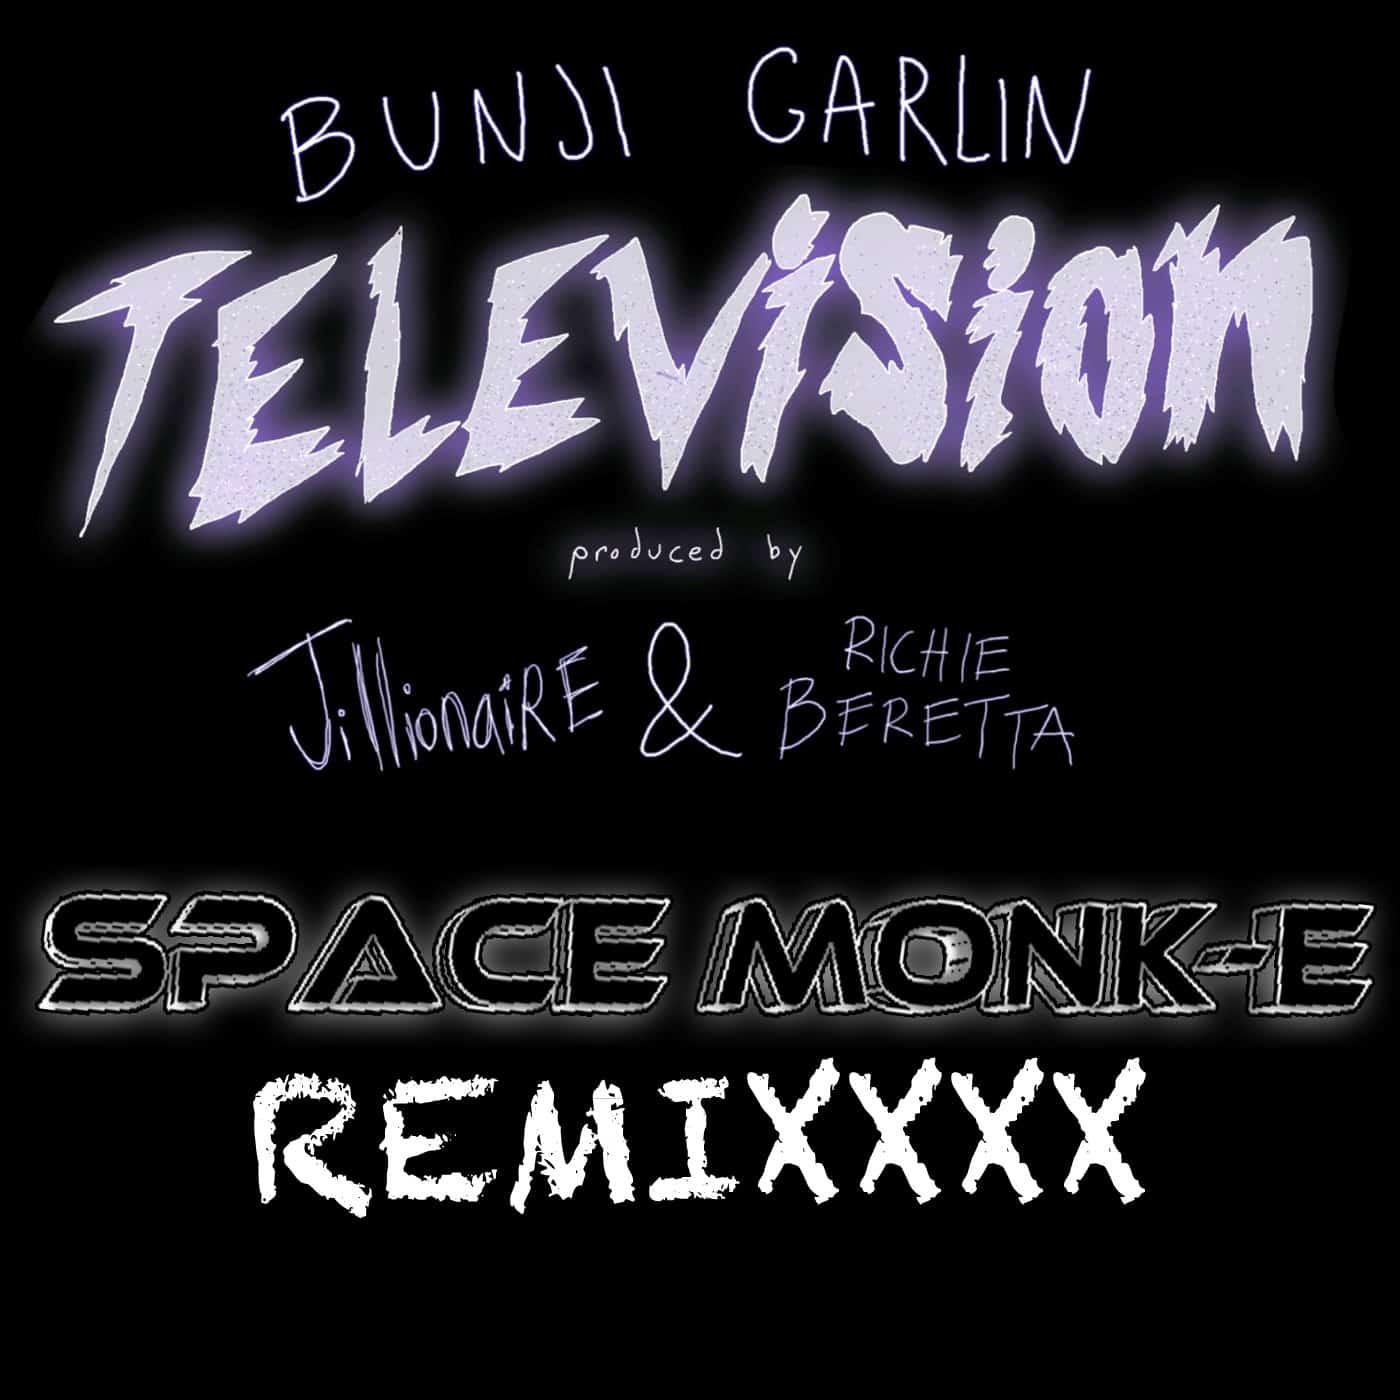 Bunji Garlin - Television (Space Monk-E Remixxx) | - Music